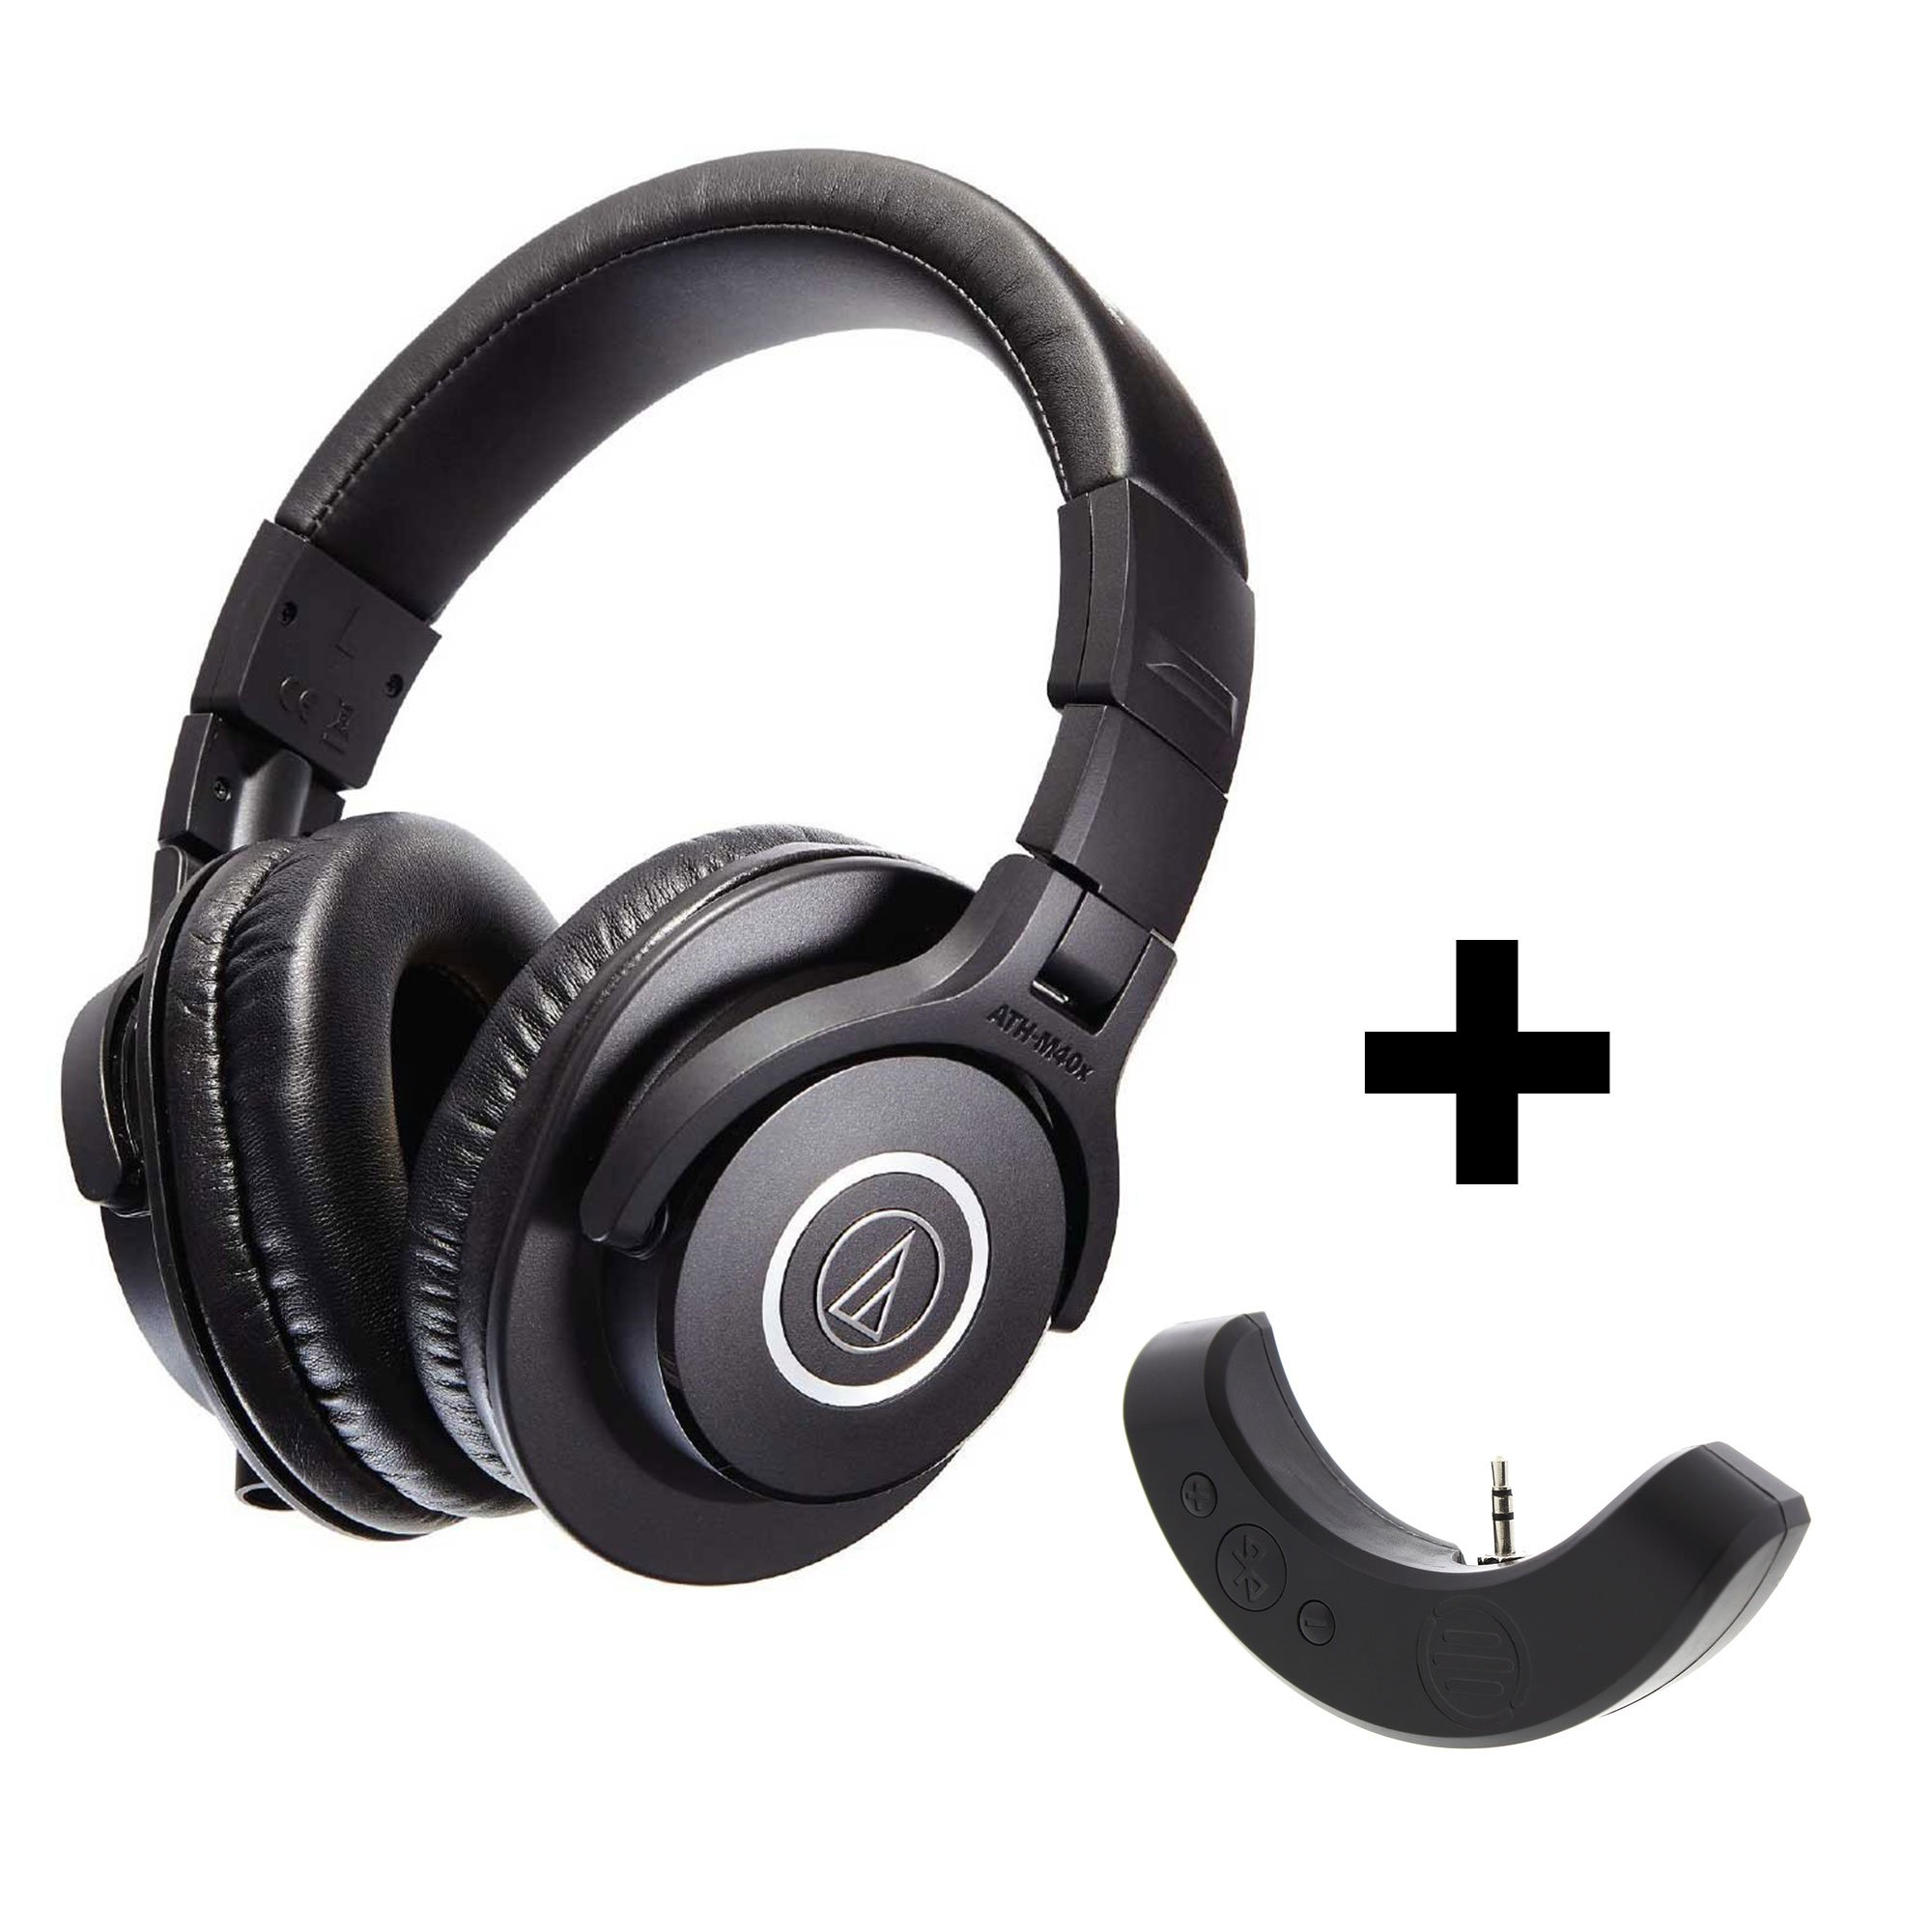 Audio-Technica ATH-M40x Professional Studio Monitor Headphones with Bluetooth Adapter-Amplifier BAL-M40X